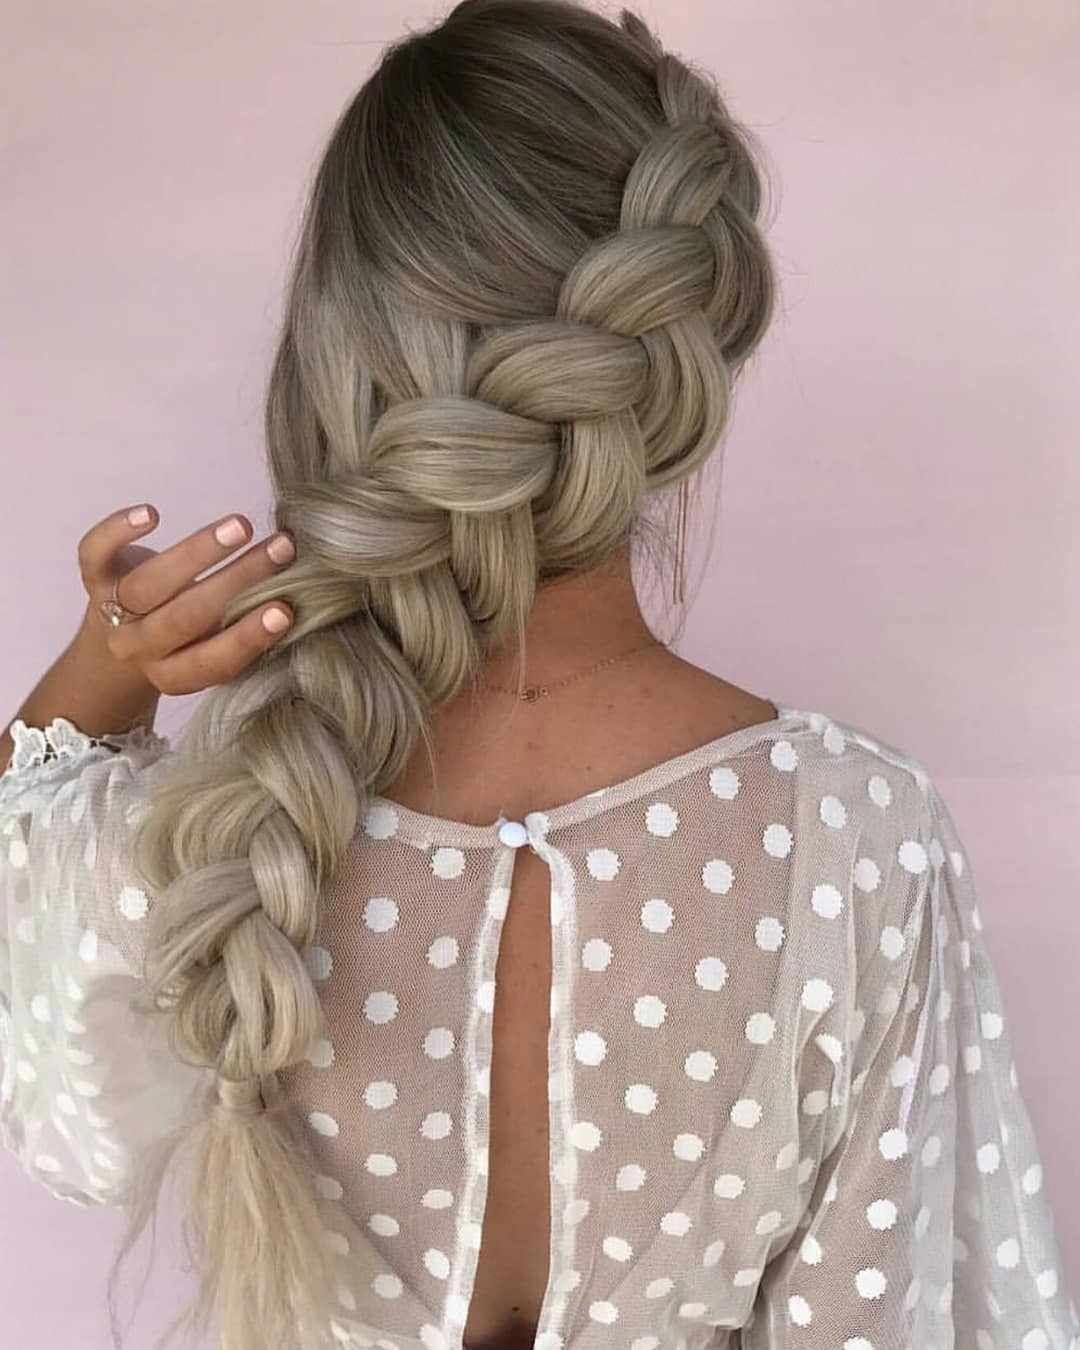 Loading... Braidedhairhairstyles - Hair Beauty